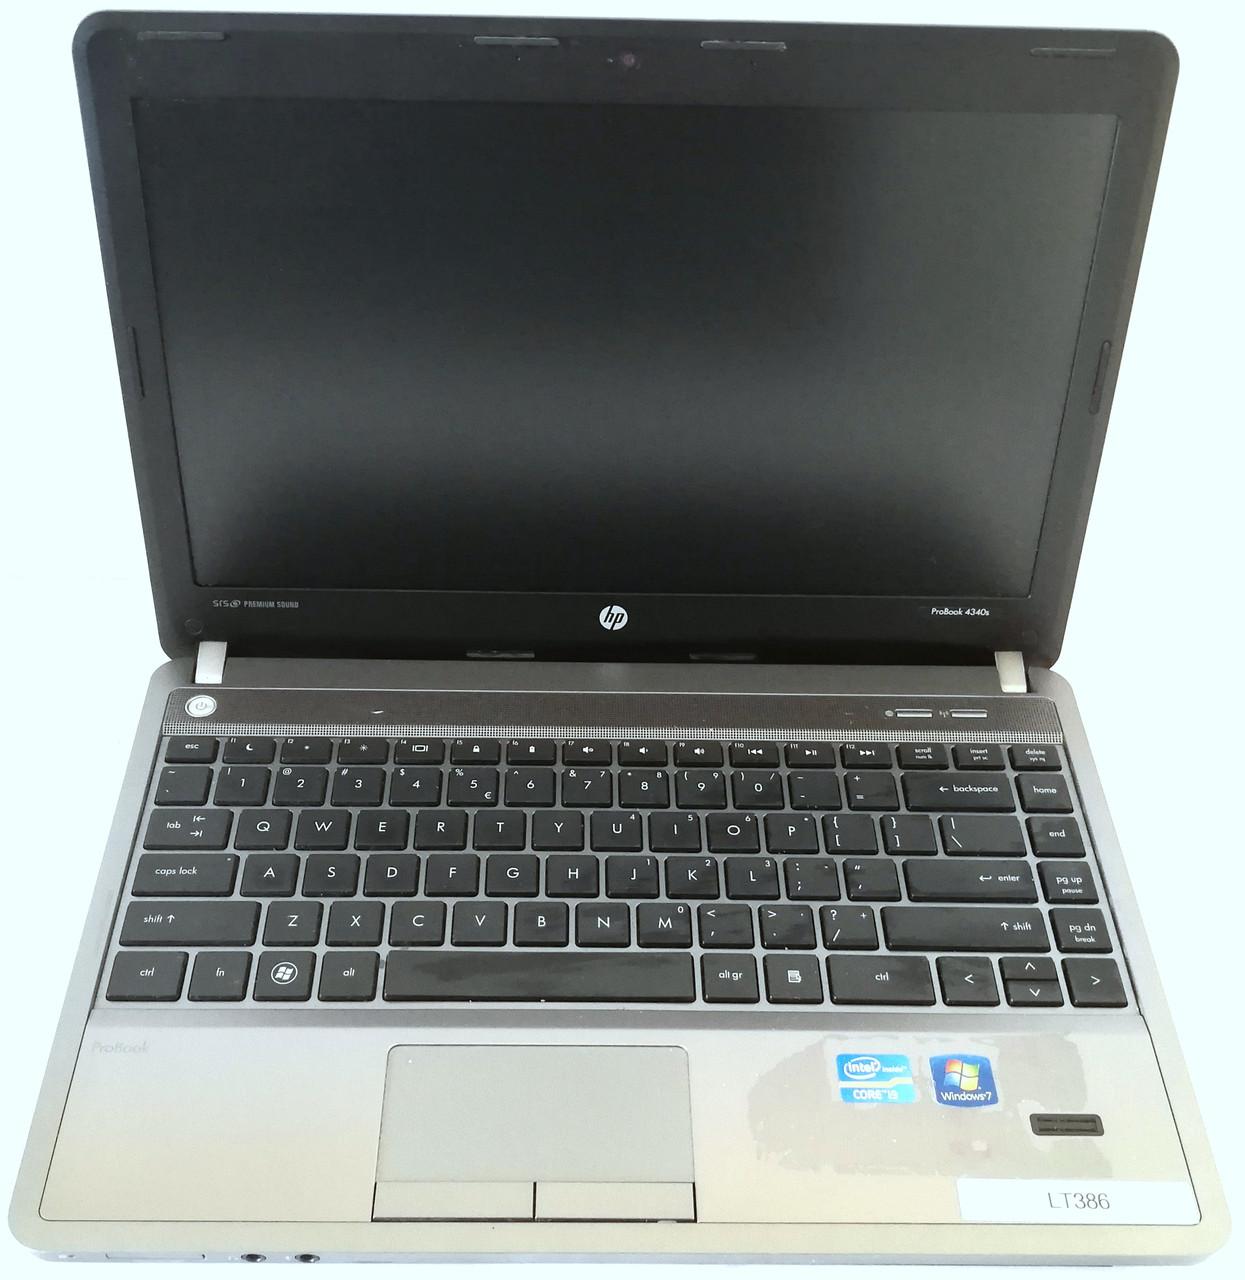 "Ноутбук HP ProBook 4340S 13.3"" Intel Core i3-2370M 2.4 ГГц Б/У На запчасти"